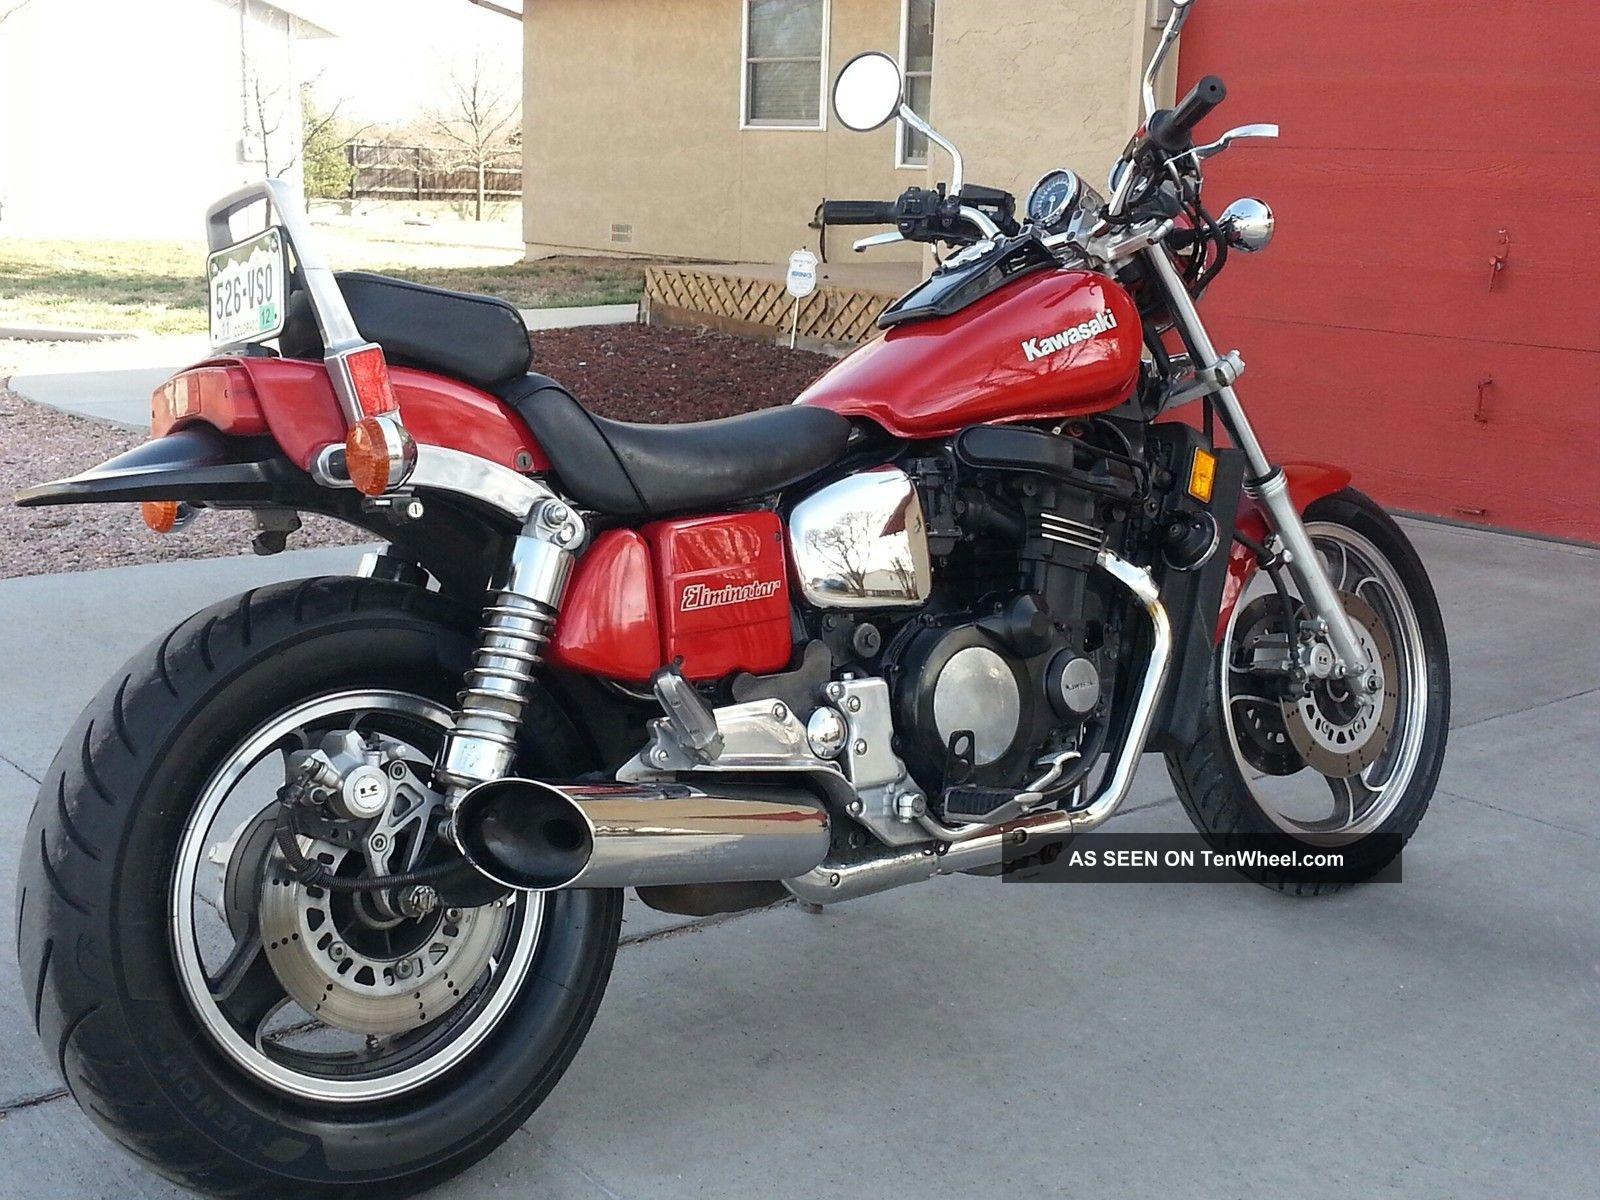 Motorcycles - Kawasaki - Other Web Museum